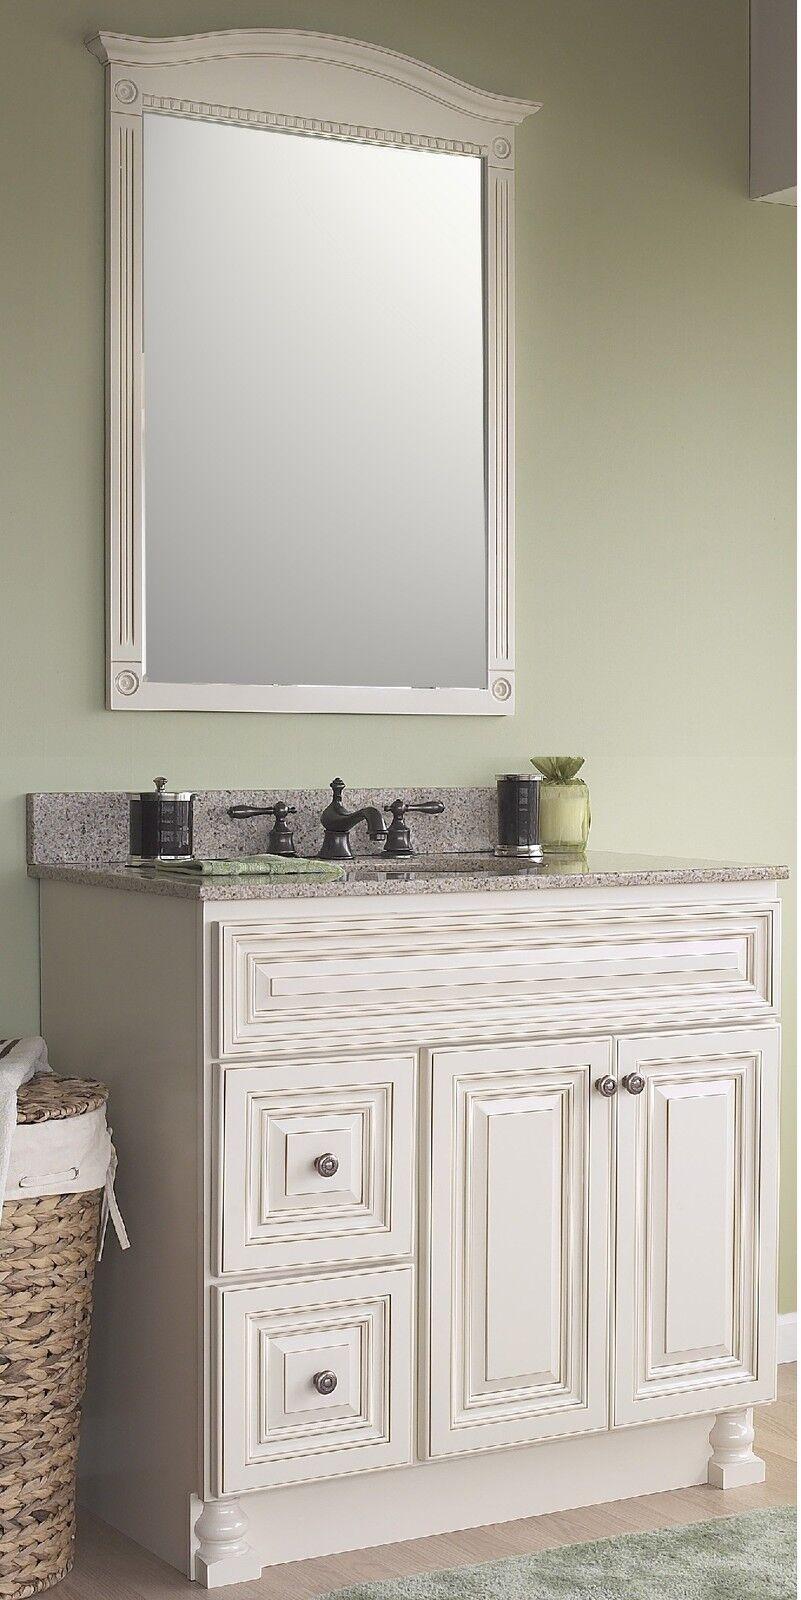 jsi wheaton cream bathroom vanity set 36 cabinet base 2 lh drawers 30